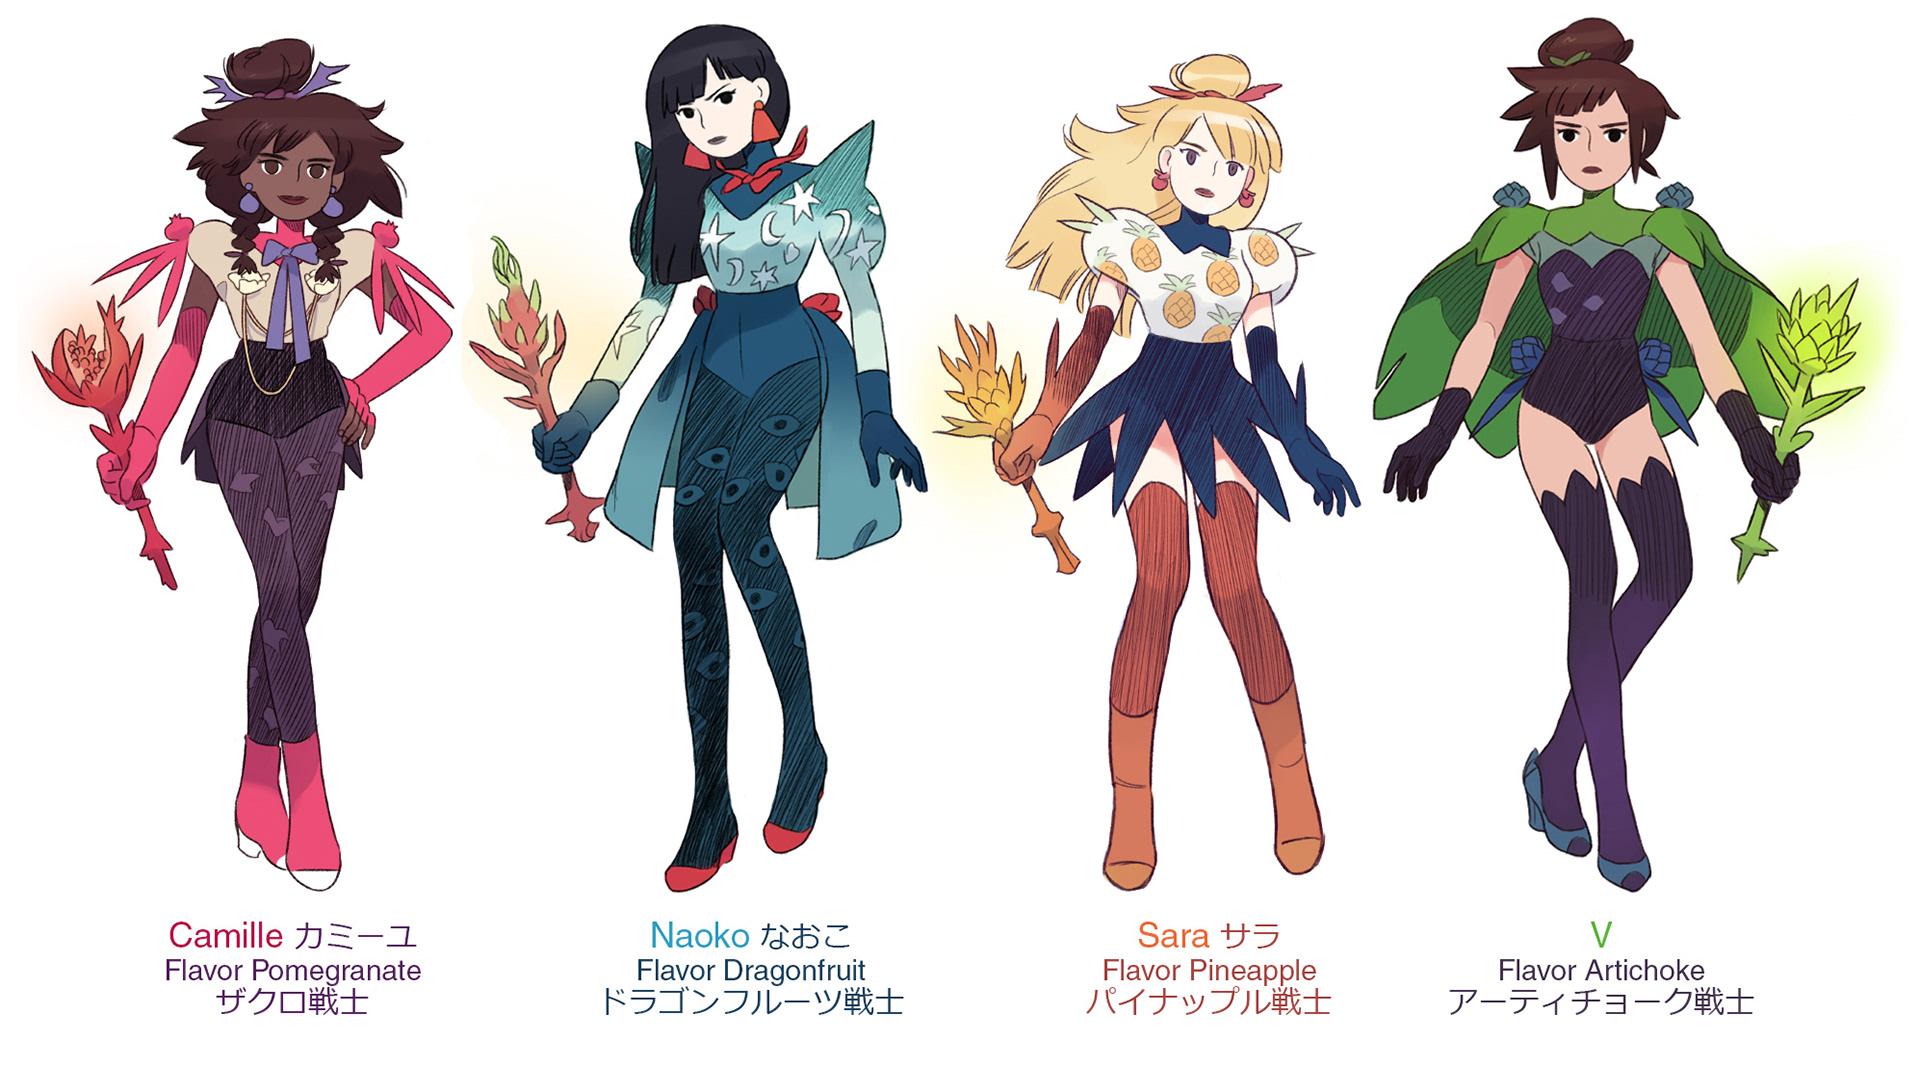 loic locatelli kournwsky flavor girls characters